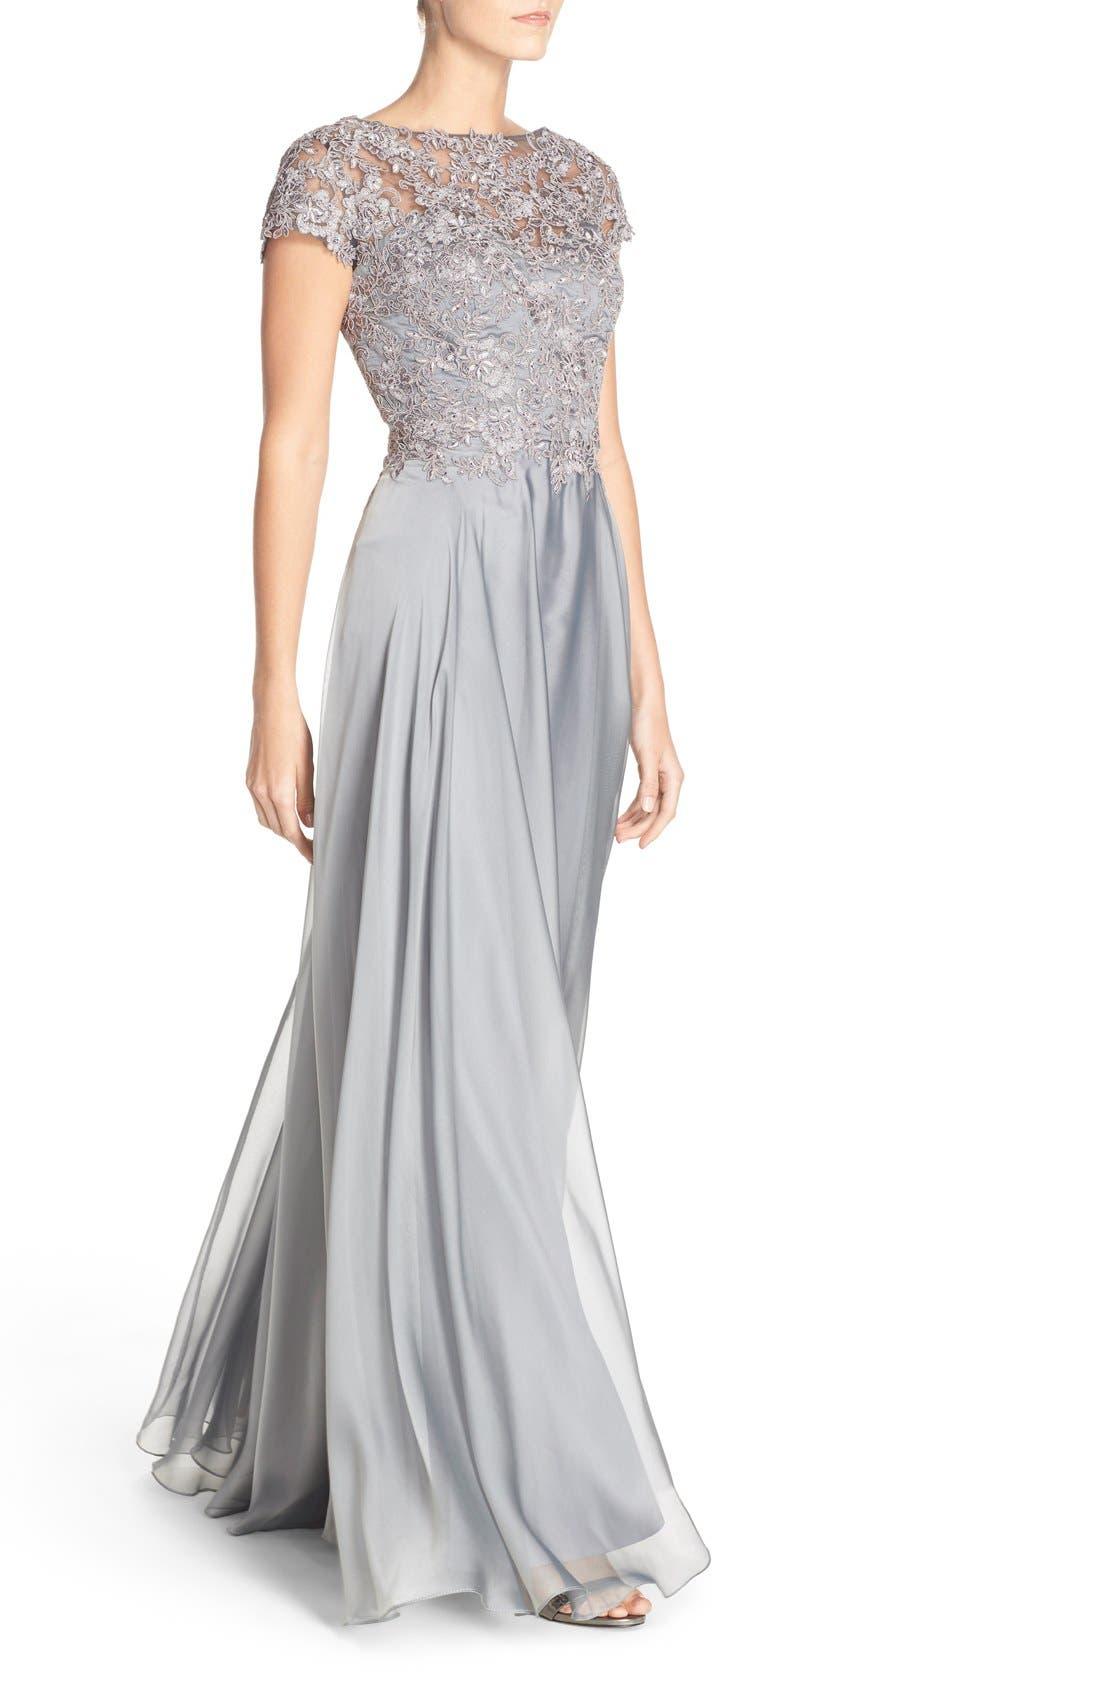 LA FEMME, Embellished Lace & Satin Ballgown, Alternate thumbnail 3, color, PLATINUM